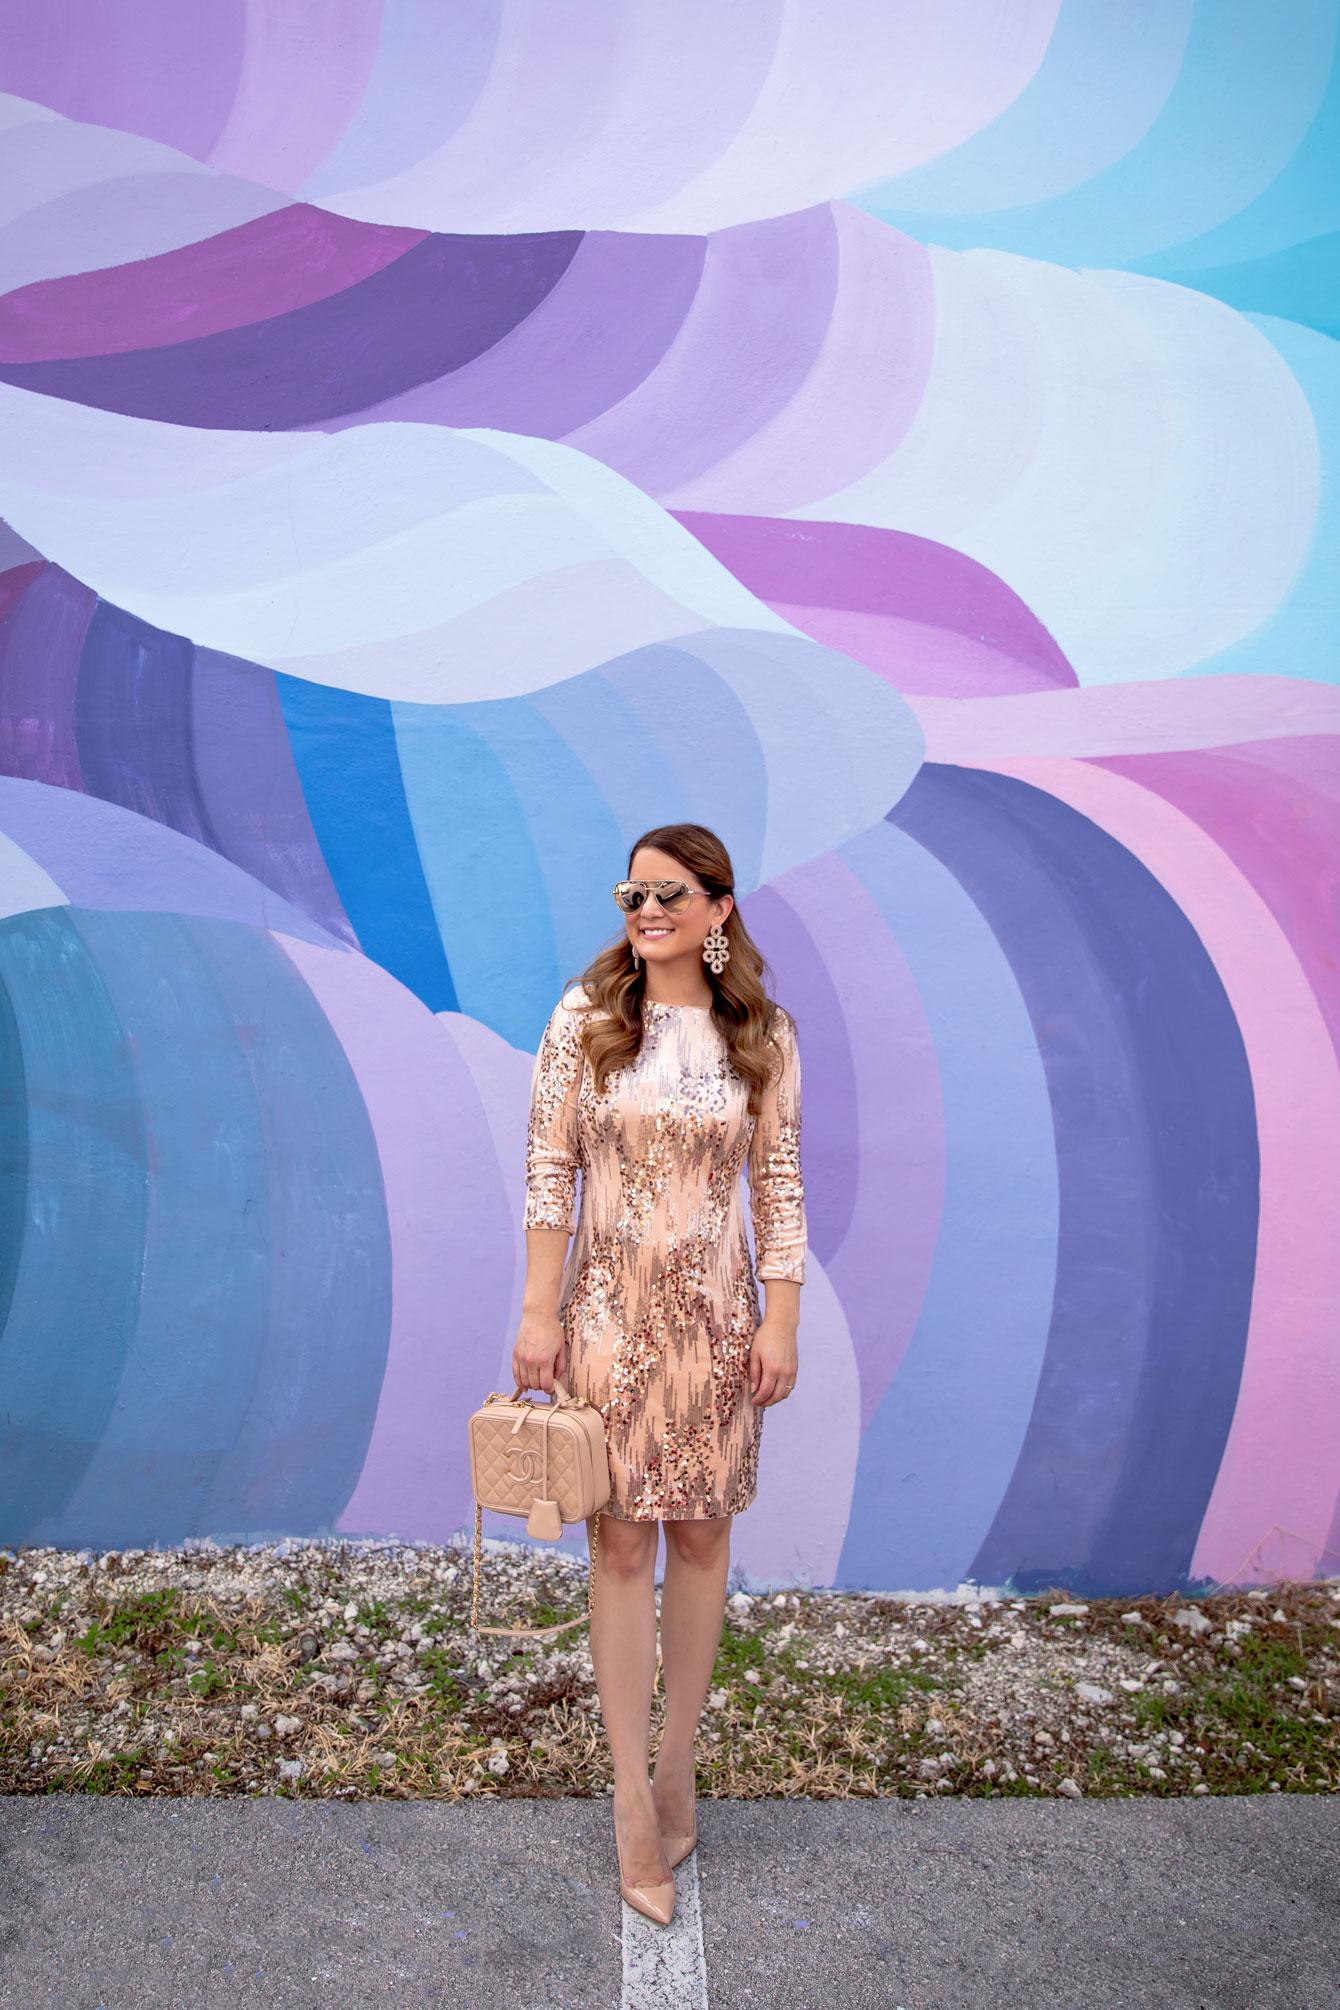 Miami Wynwood Swirl Mural